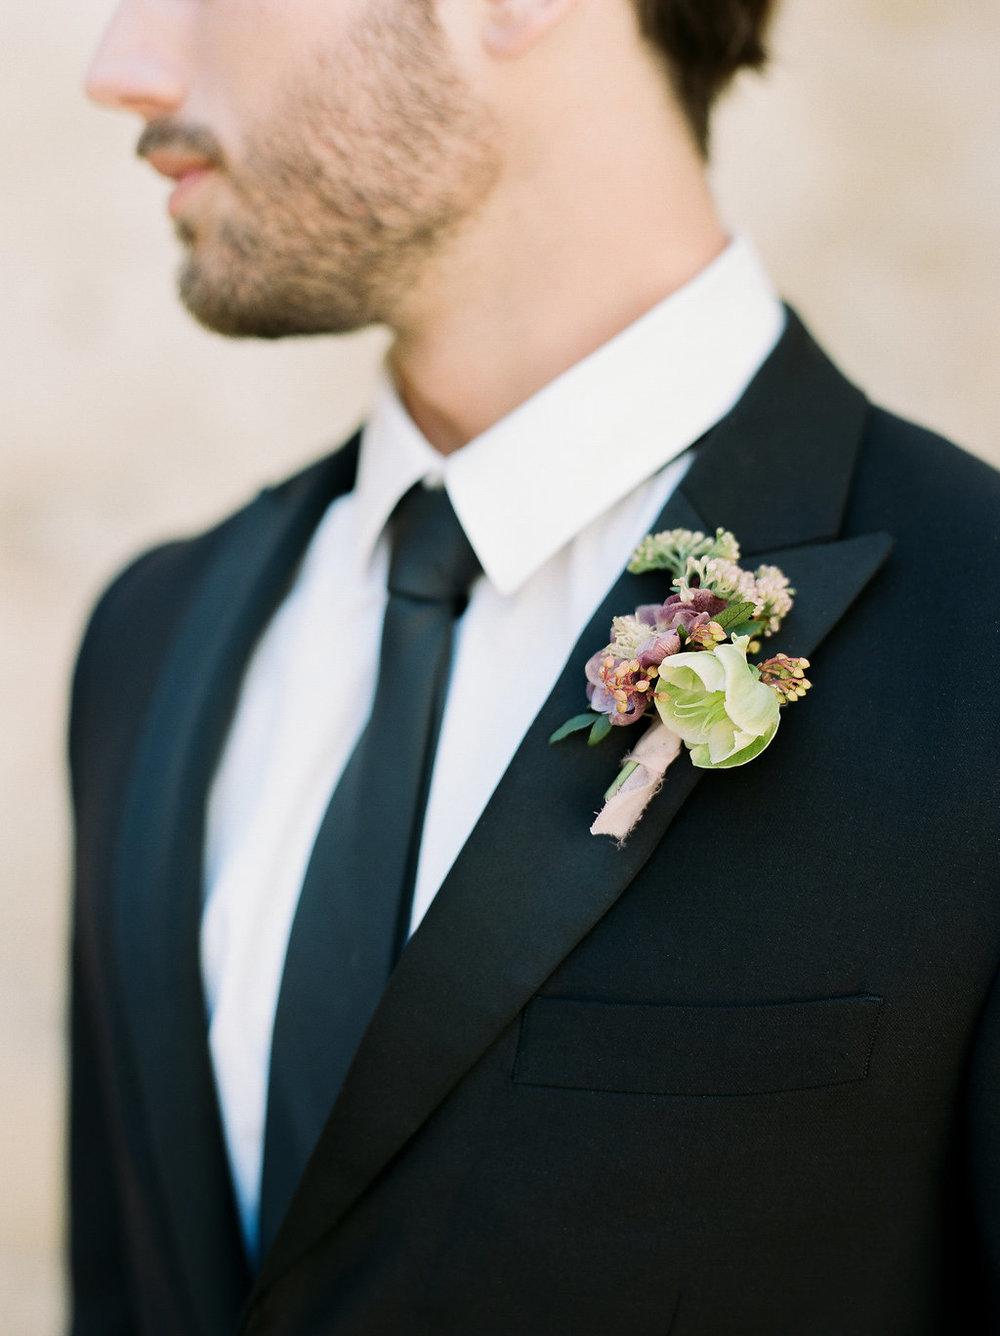 Spanish Mission Style Wedding Ideas Summer Flowers Finding Flora San Juan Capistrano European Venues California Groom Boutonniere